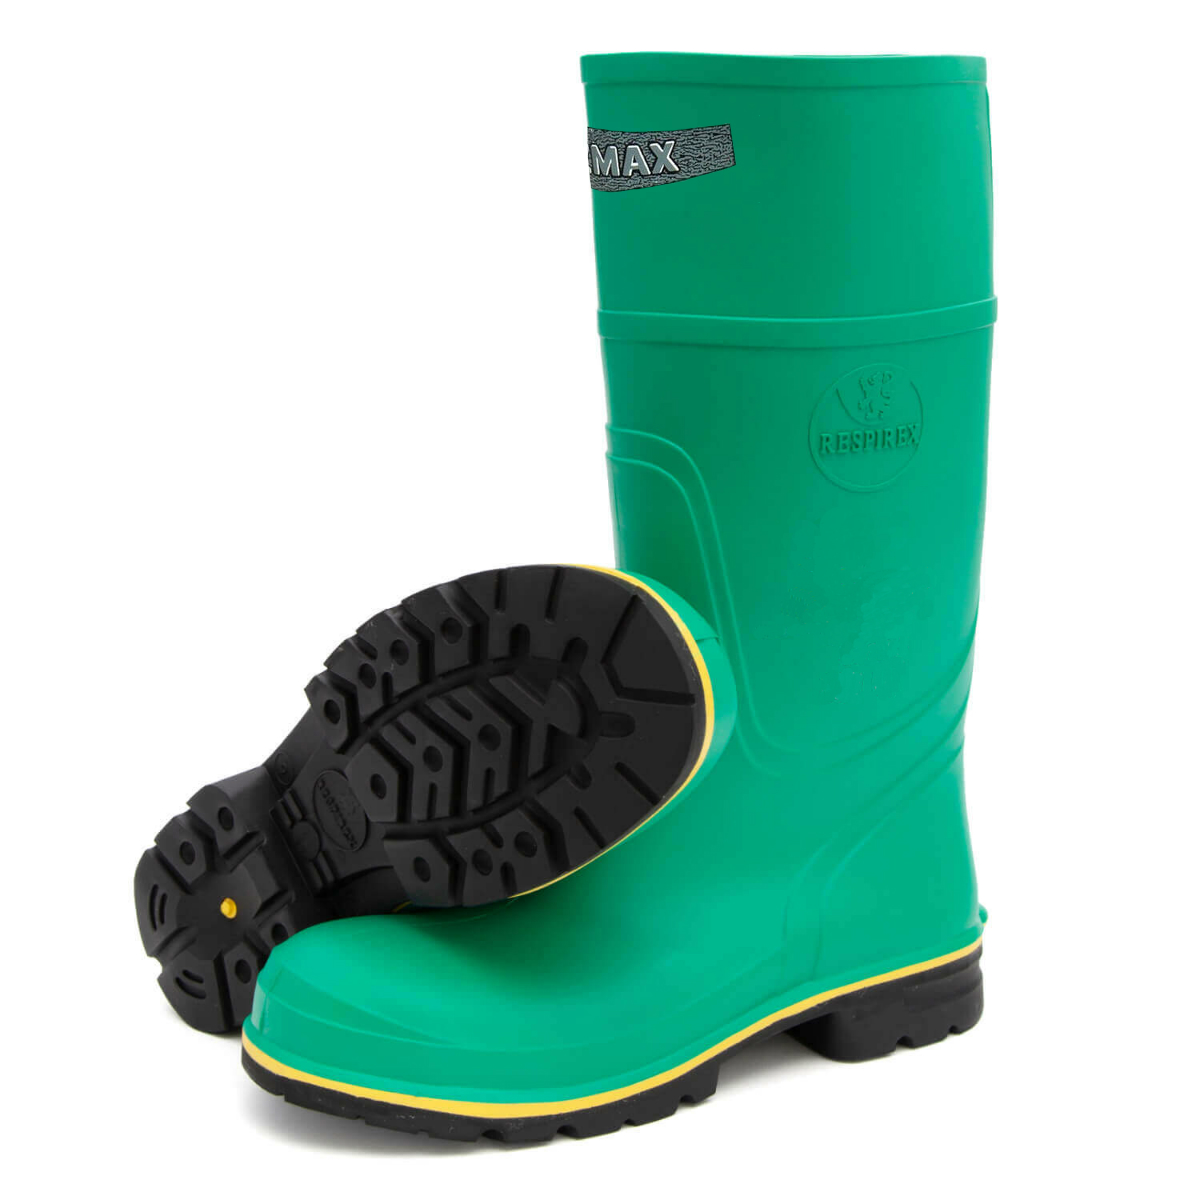 7501786cc60 Respirex Hazmax Chemical Resistant Biological Hazard Steel Toe Cap Safety  Wellingtons Boots